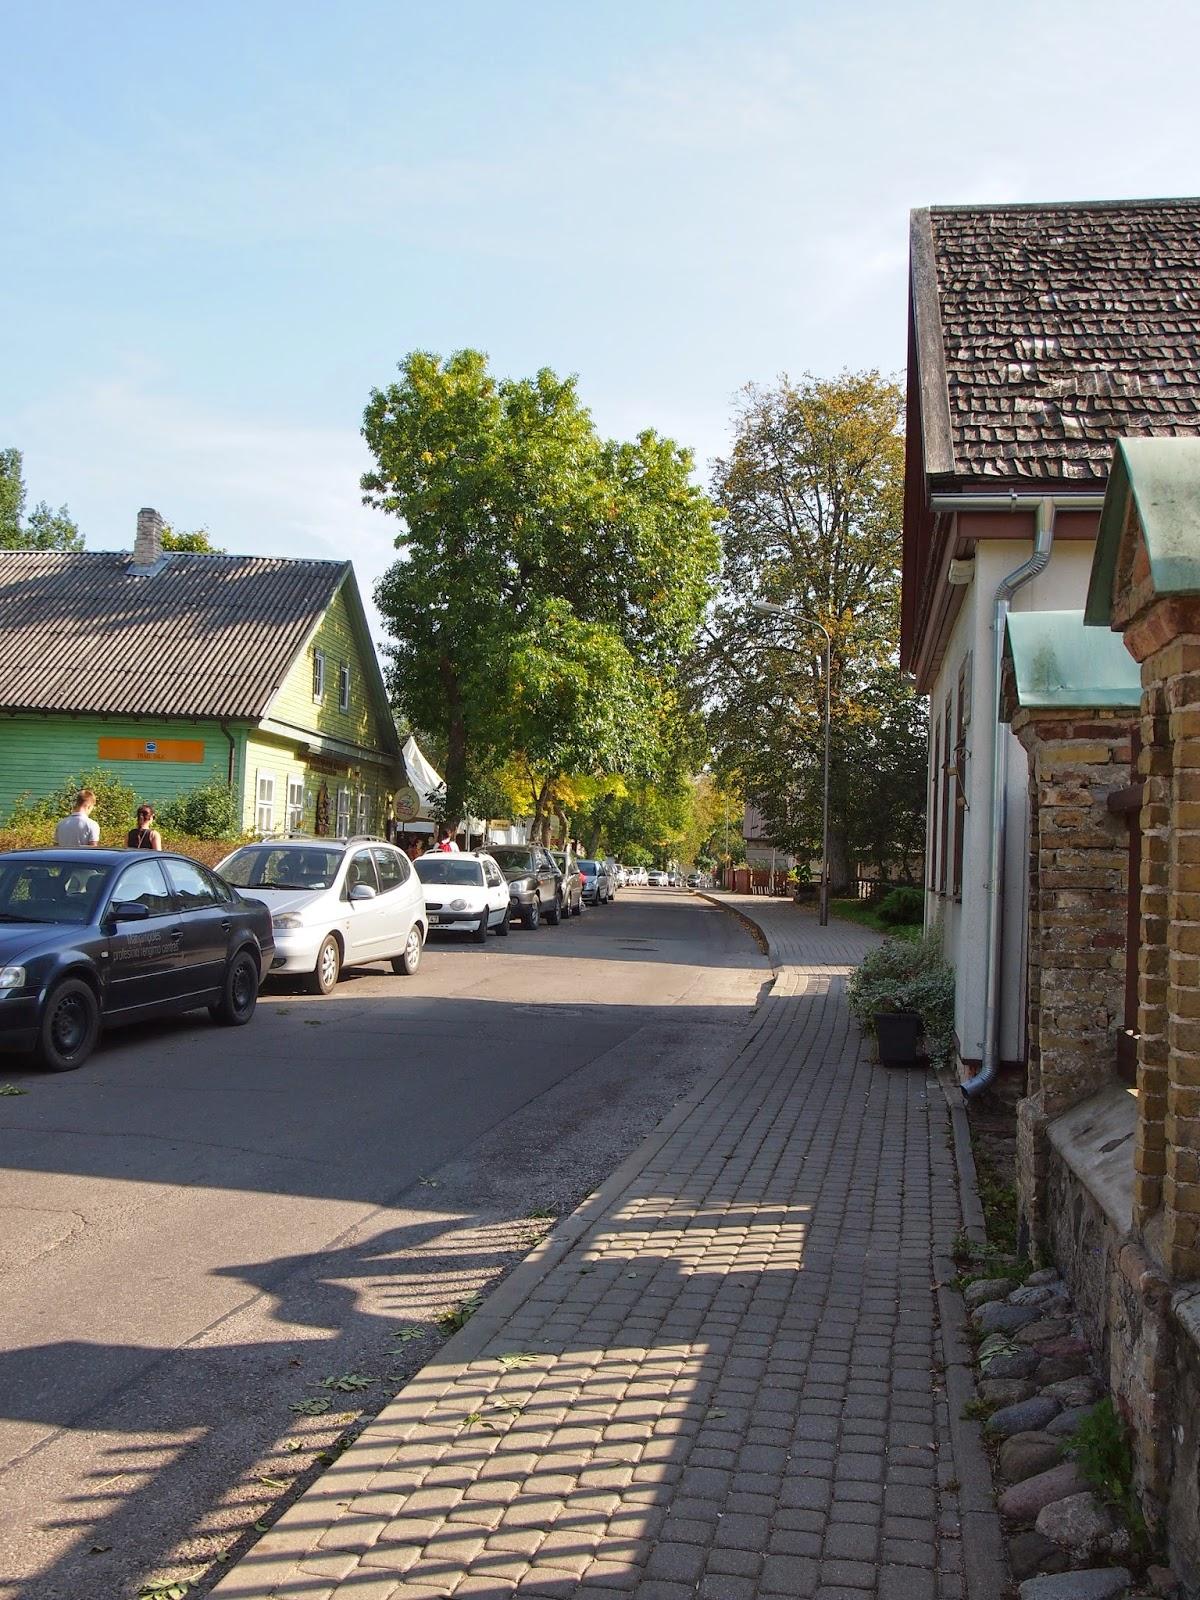 the streets of Trakai town